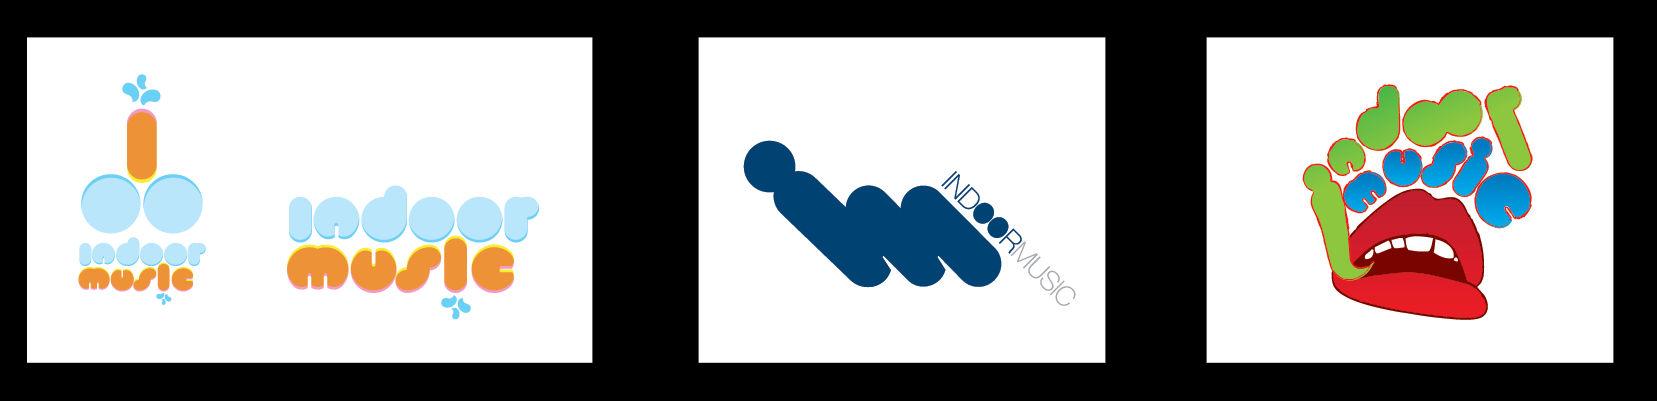 indoor music logo